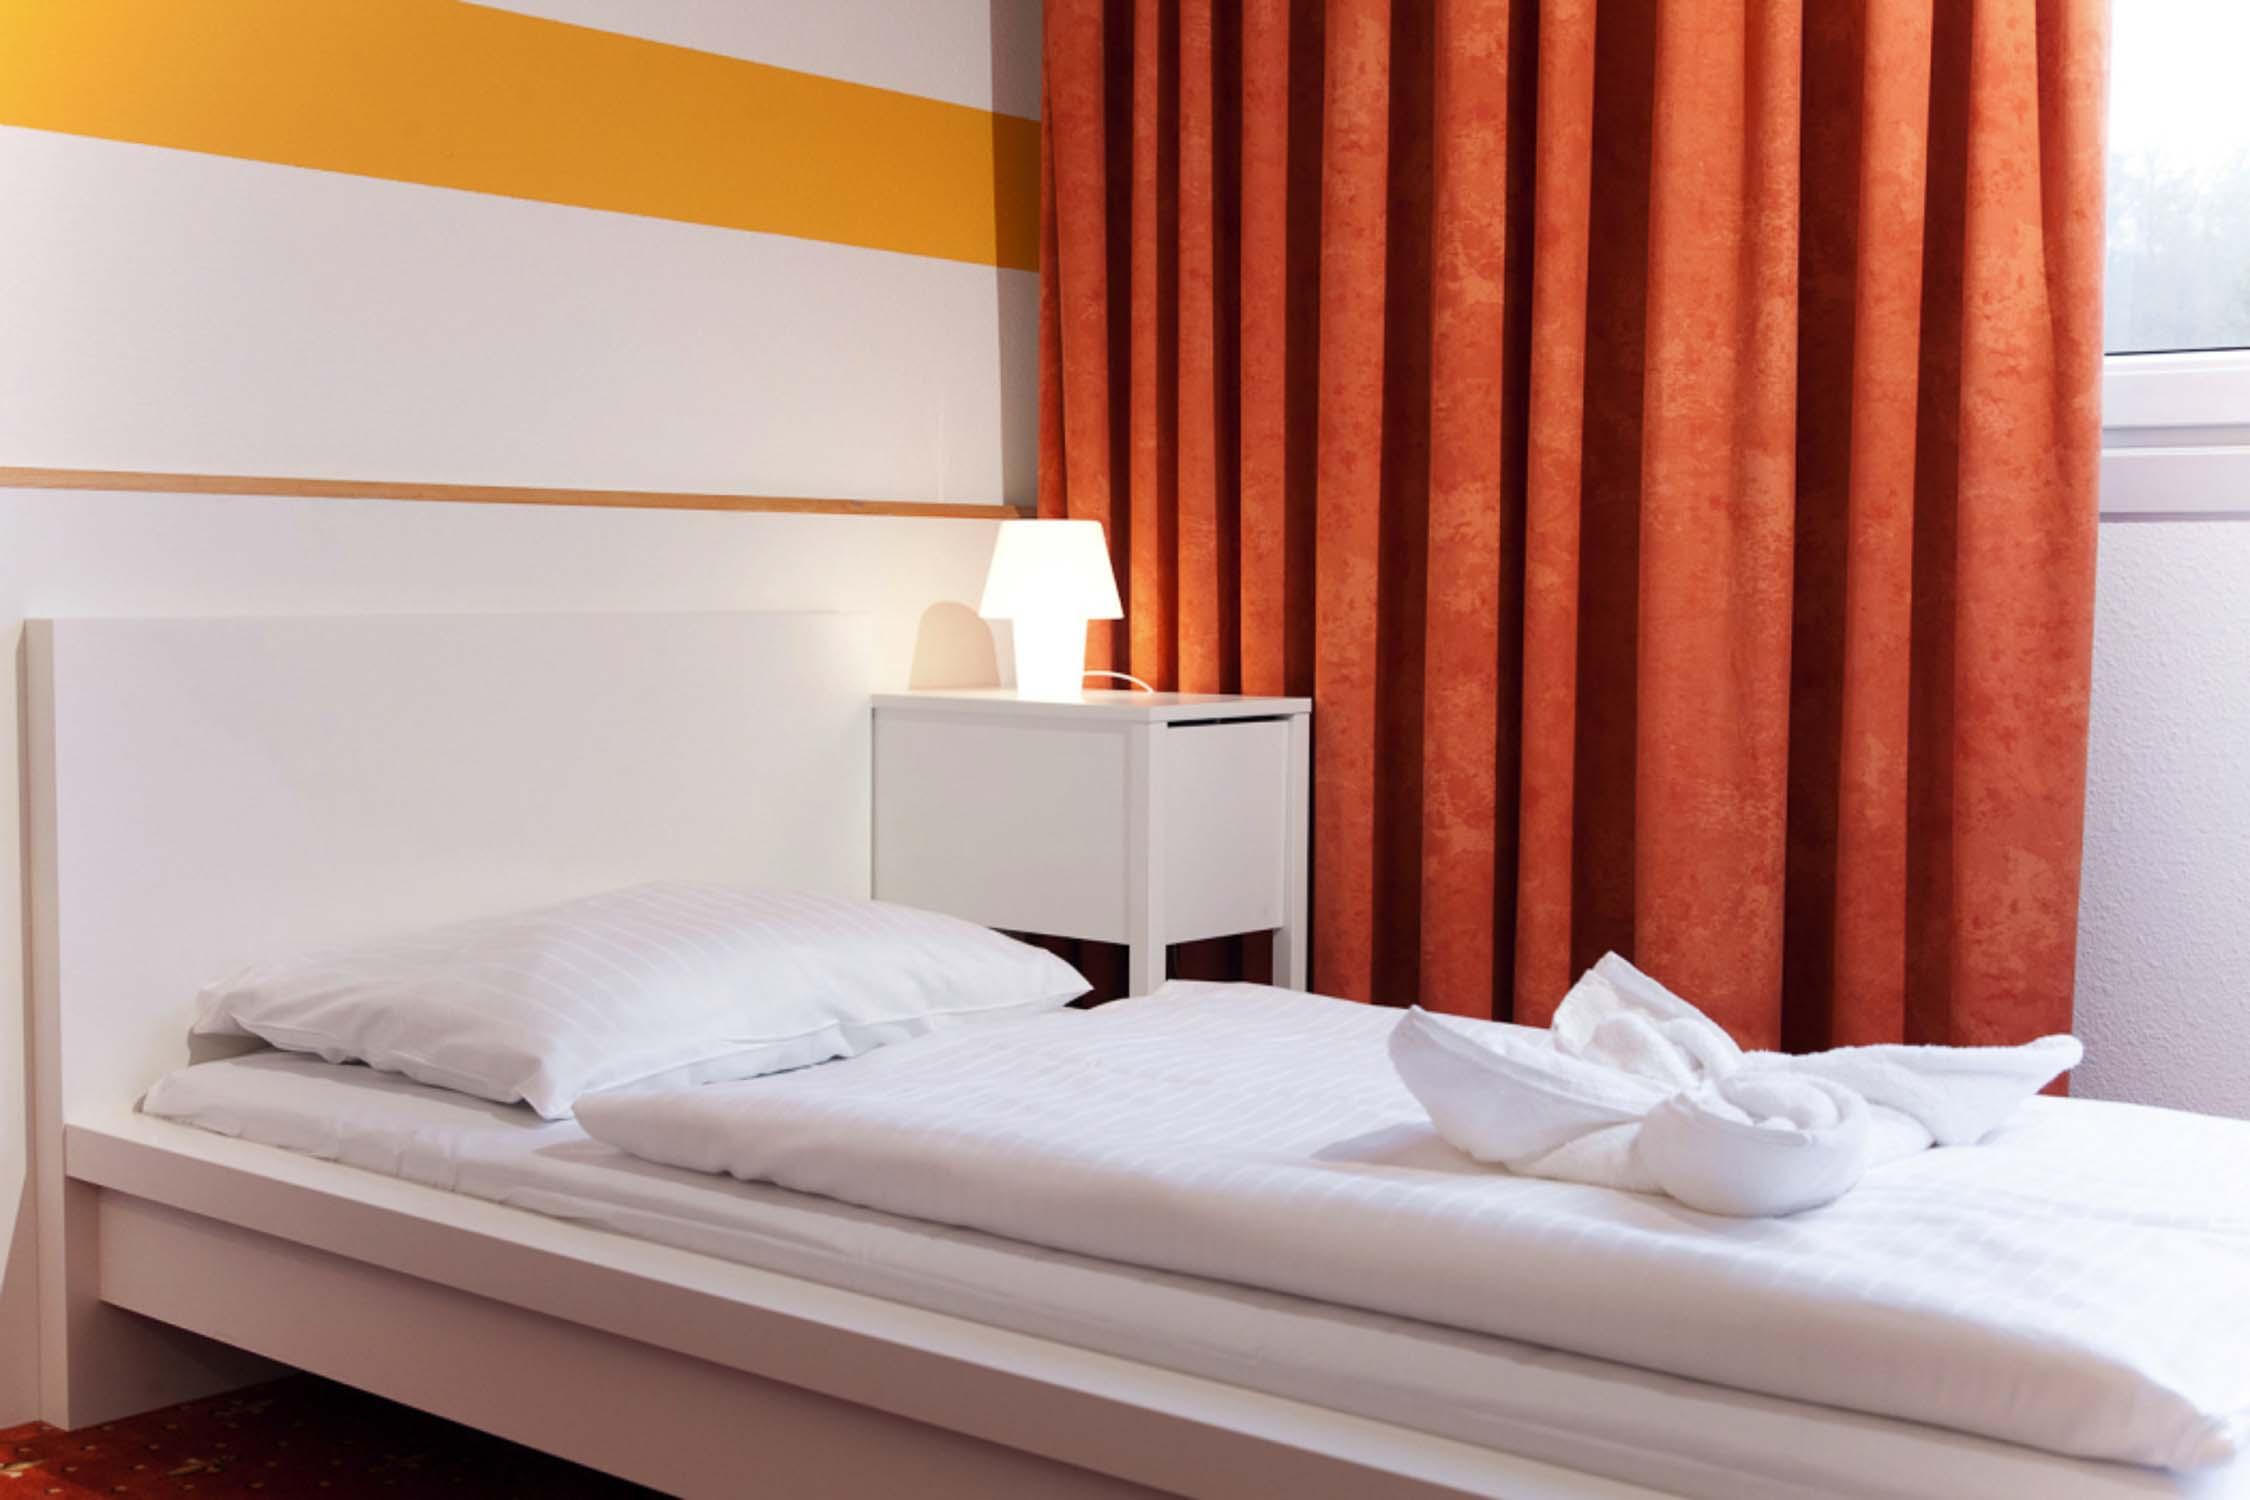 Hotelfotograf Berlin - 0180.jpg